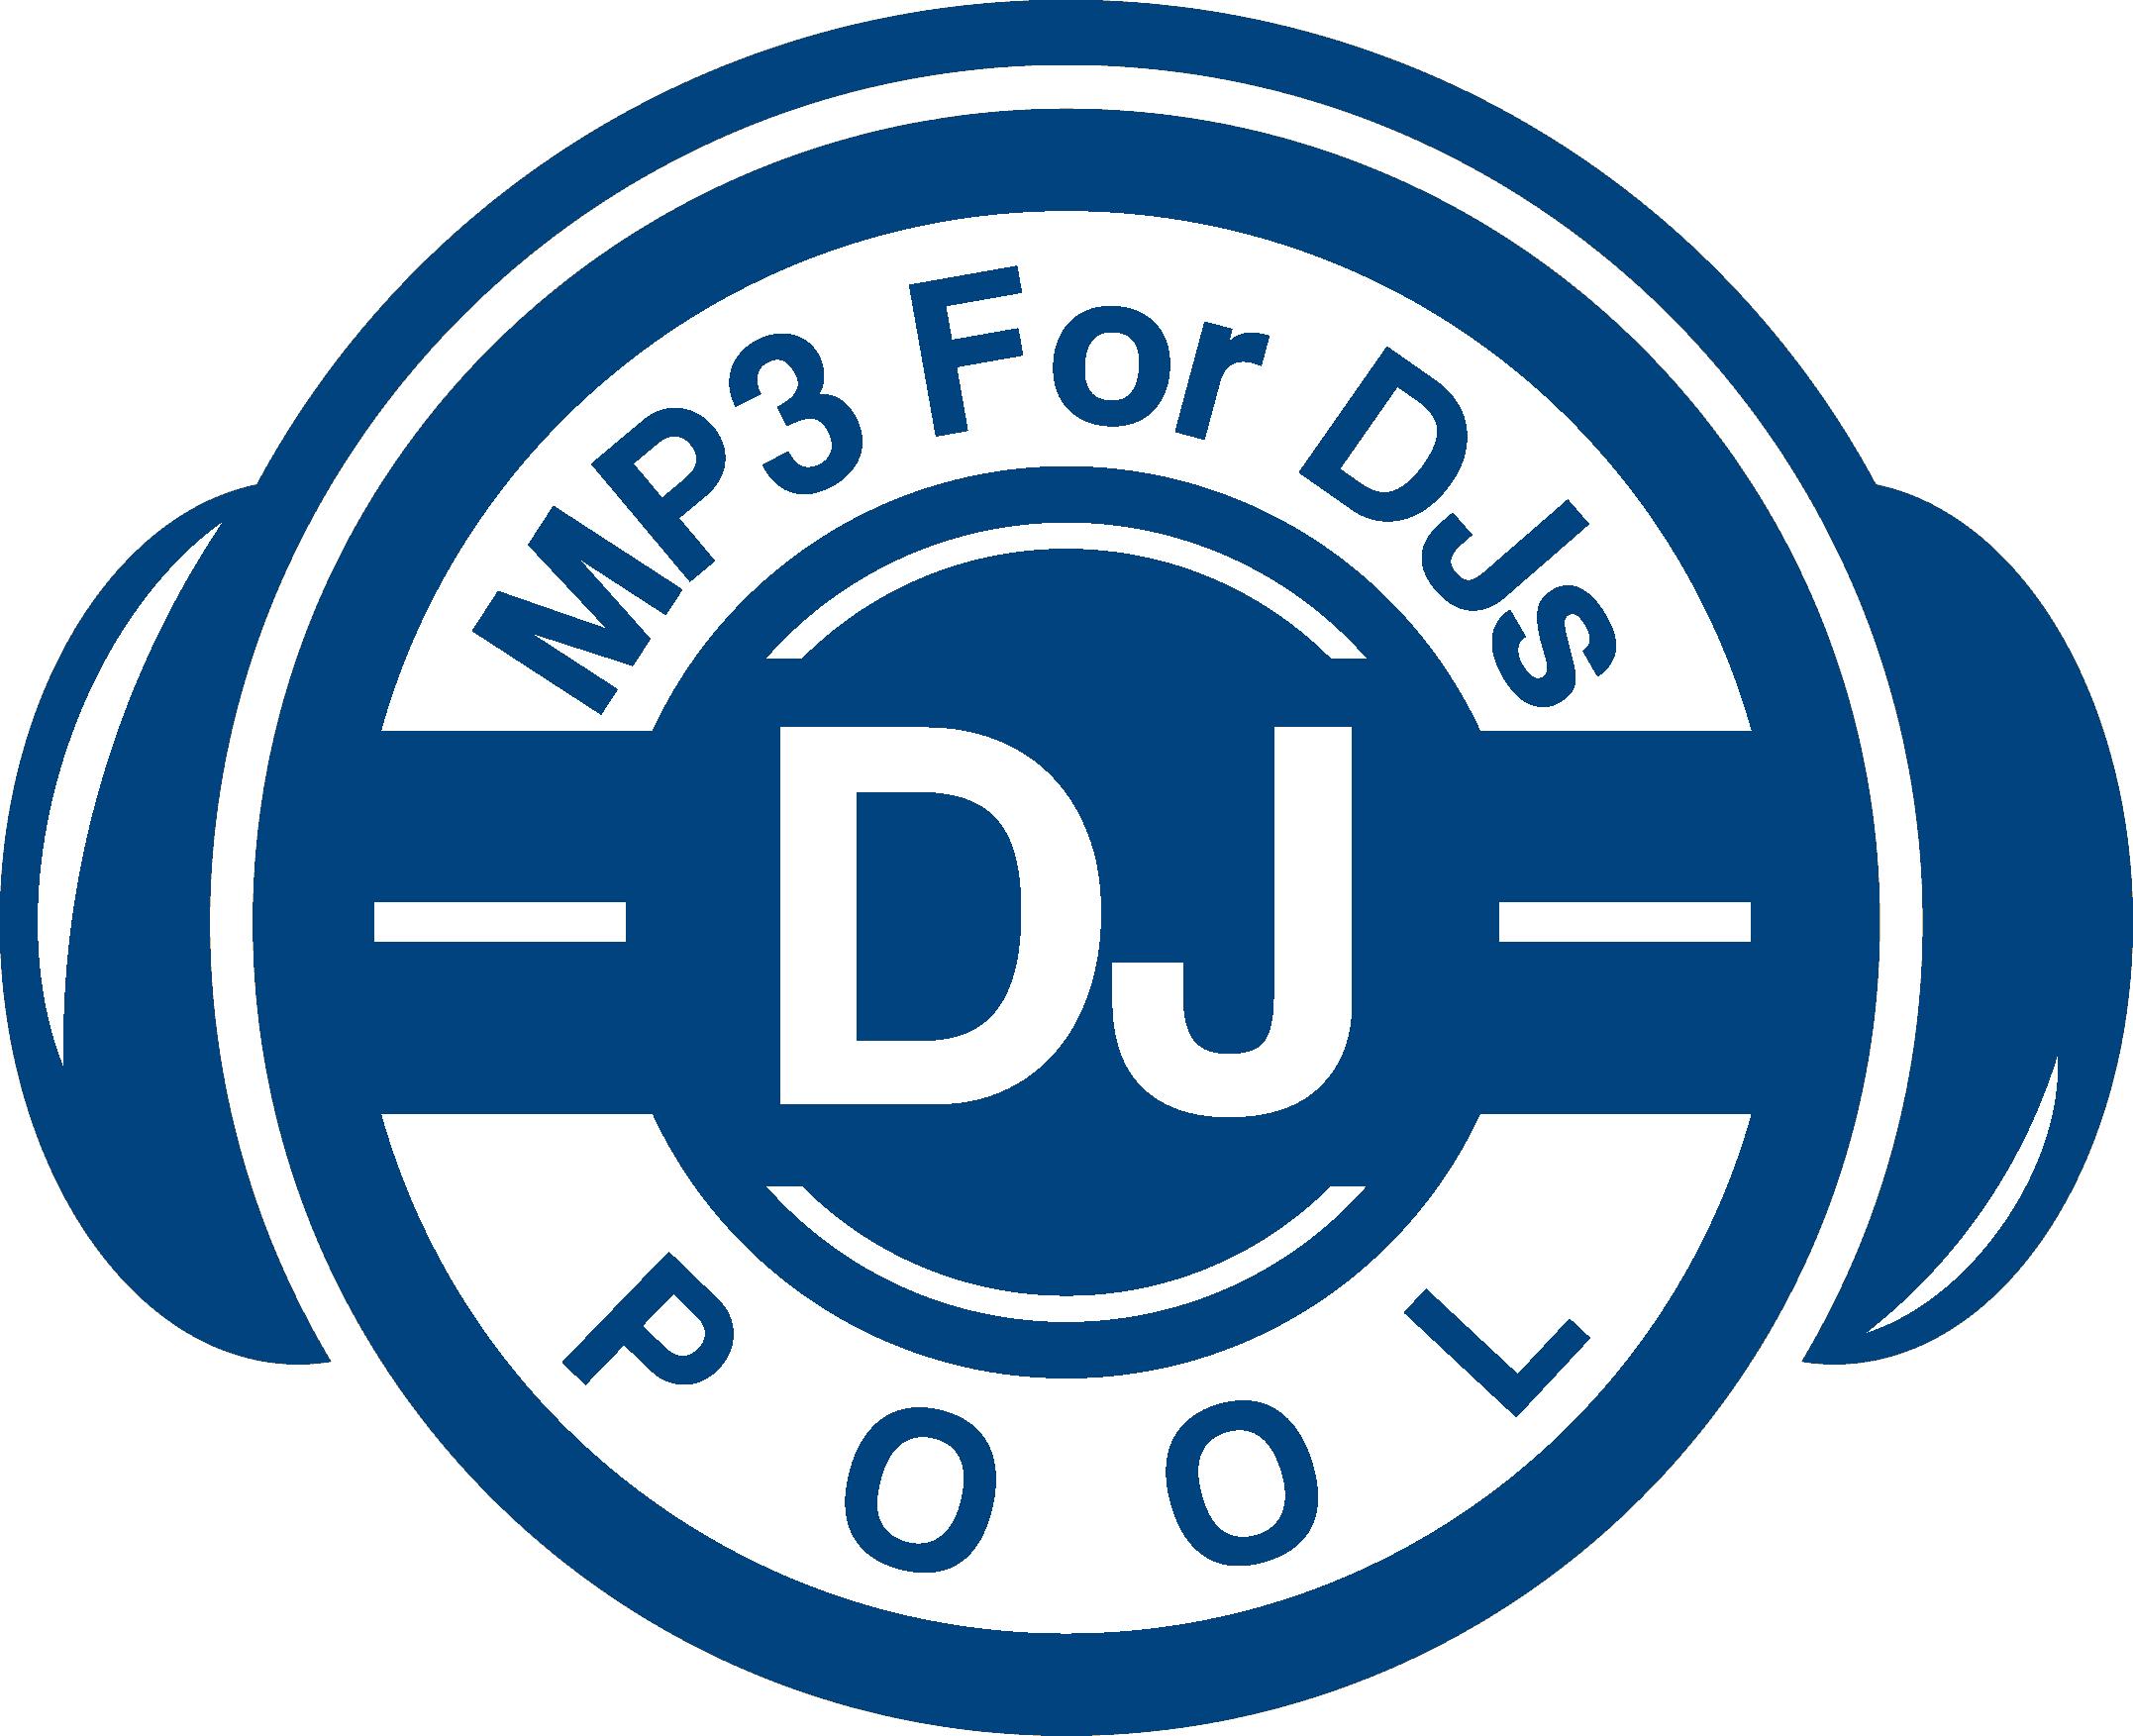 MP3 For DJs DJ Pool | MP3 Record Pool – MP3 DJ Pool – MP3